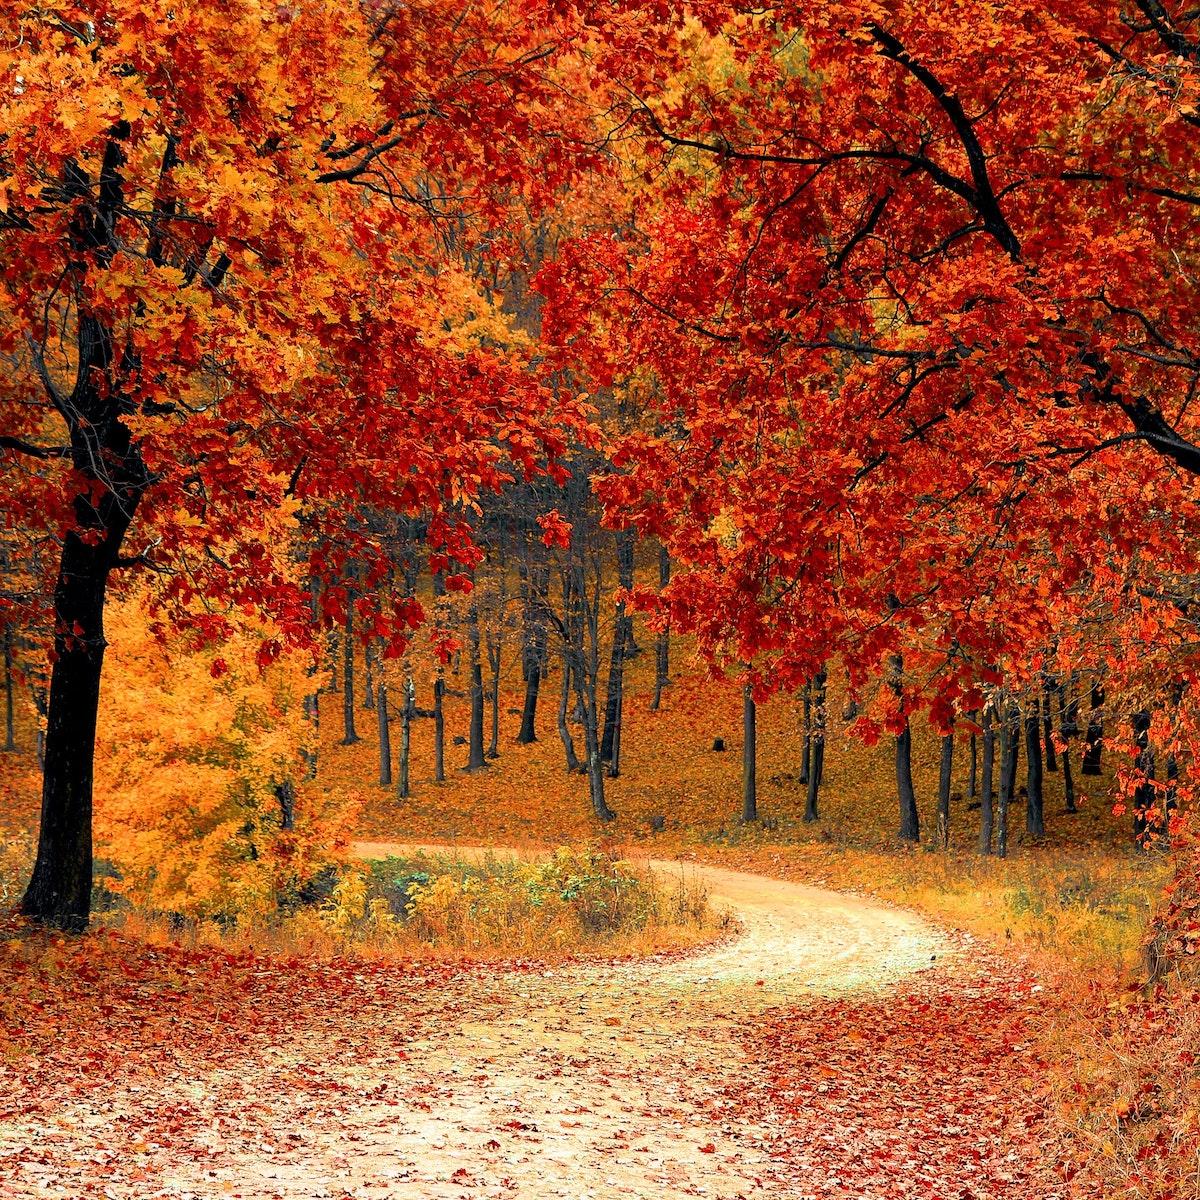 Autumn Ways: An In-Person, Outdoor Mini-Retreat